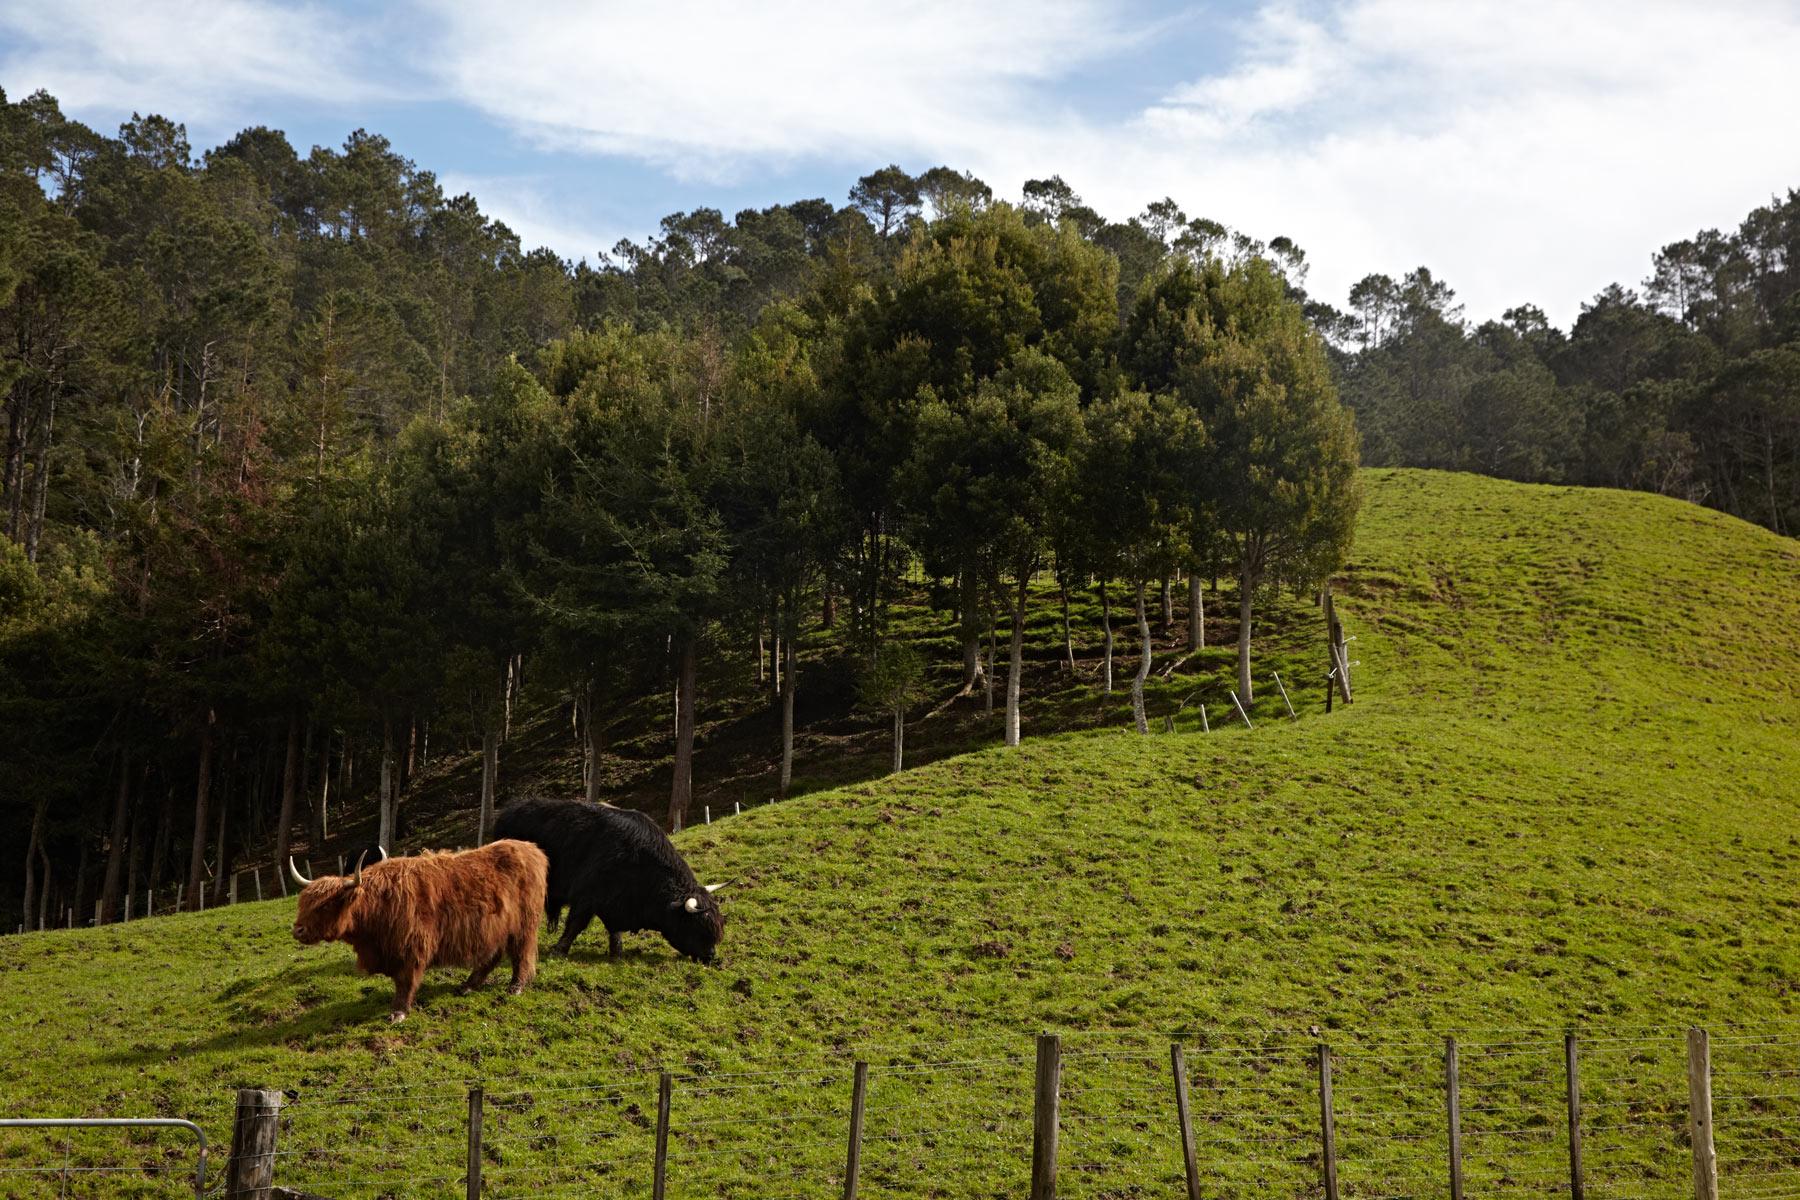 New_Zealand_North_Island_Highland_Cattle.jpg